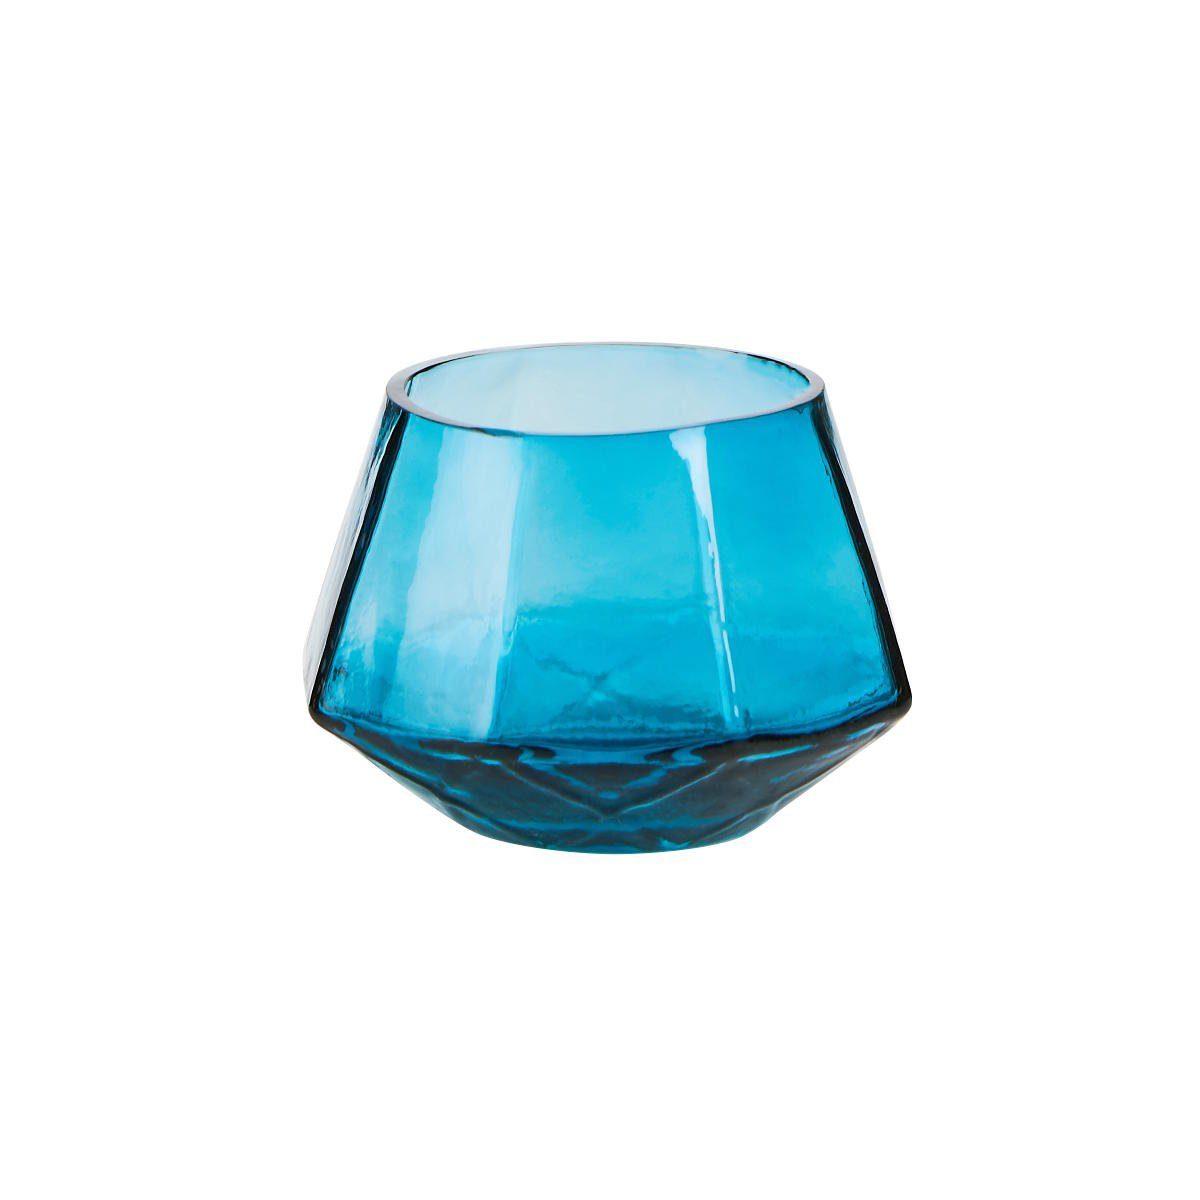 BUTLERS DELIGHT »Teelichthalter Ø 9,5cm«